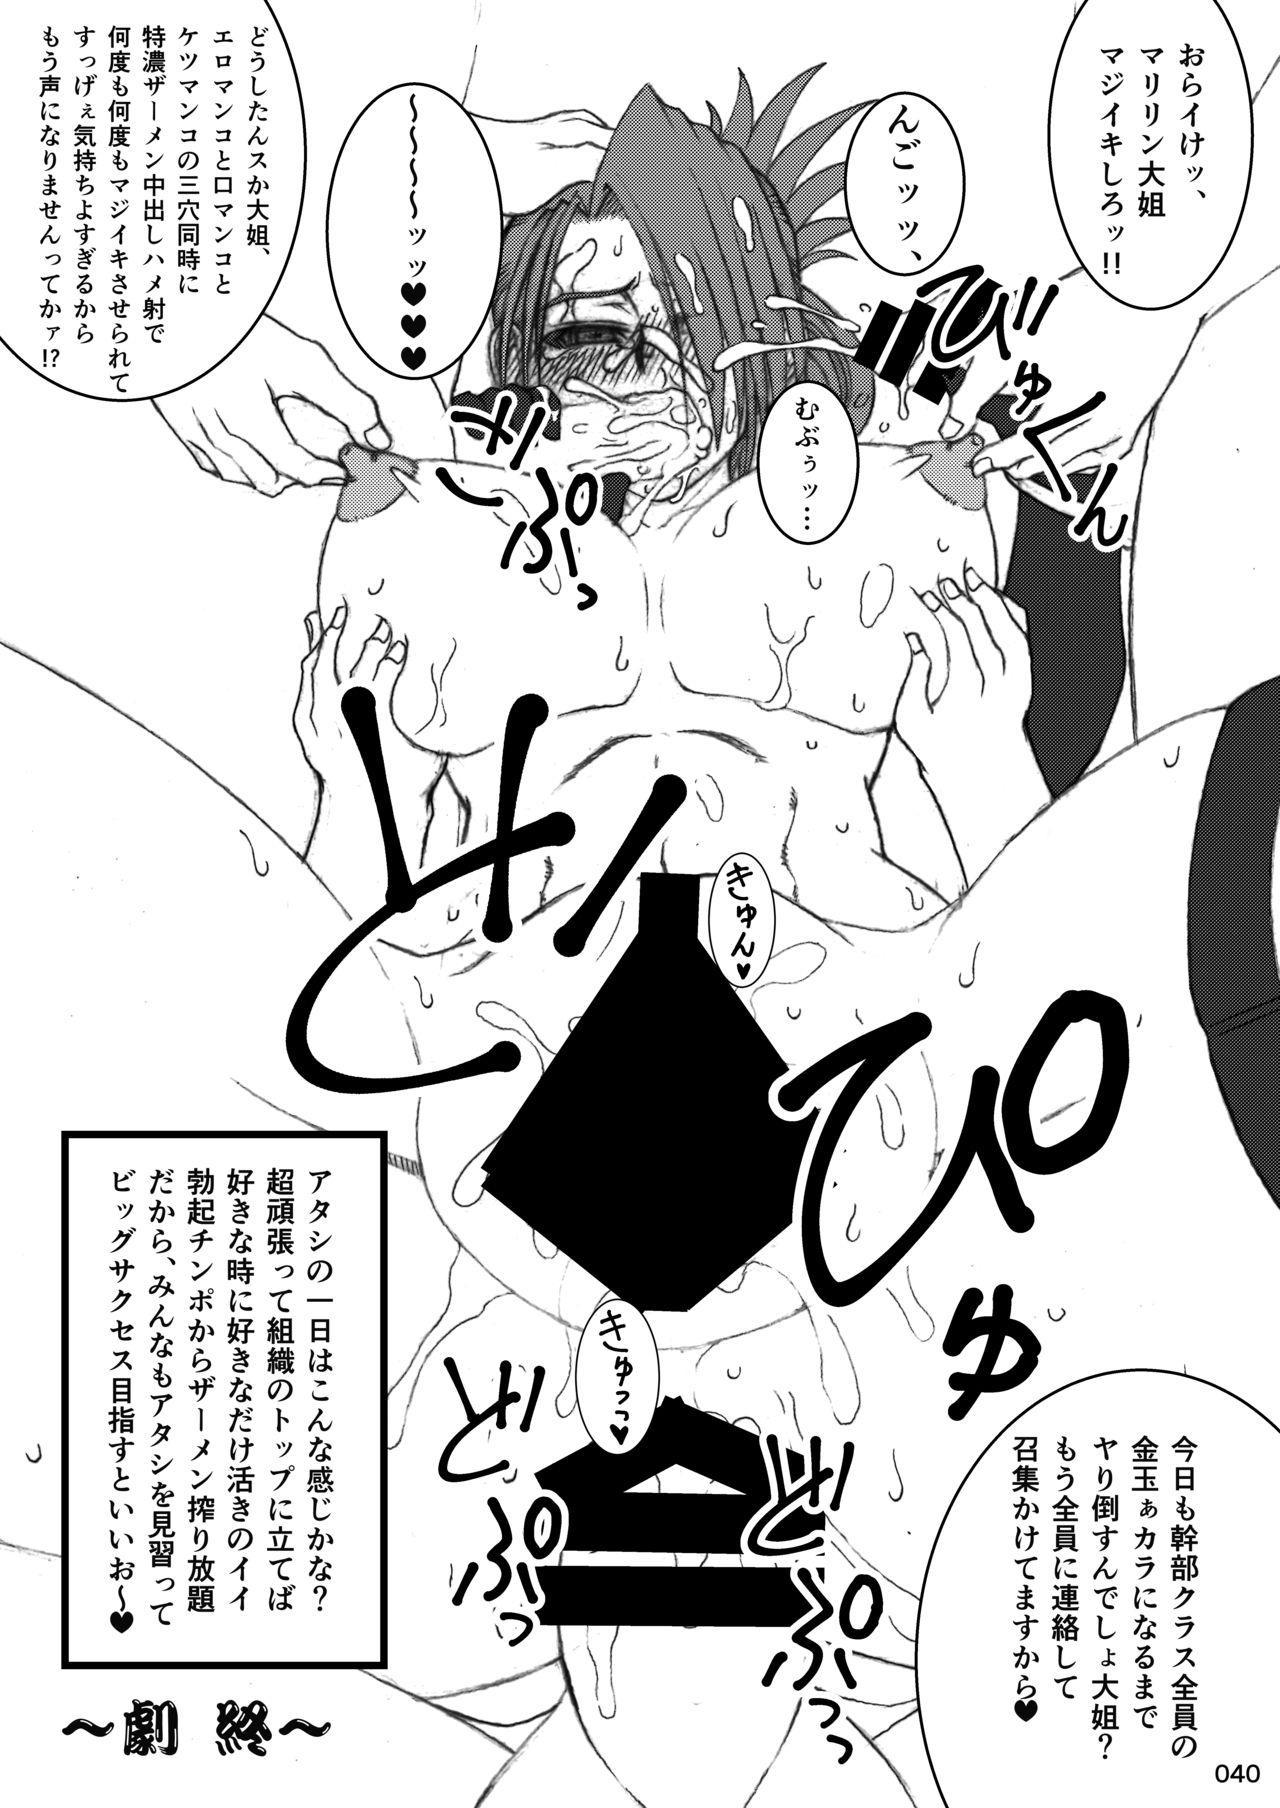 Akatsuki Blitzkampf & EN-1 Perfekt Welt Gangbang Anthology 39